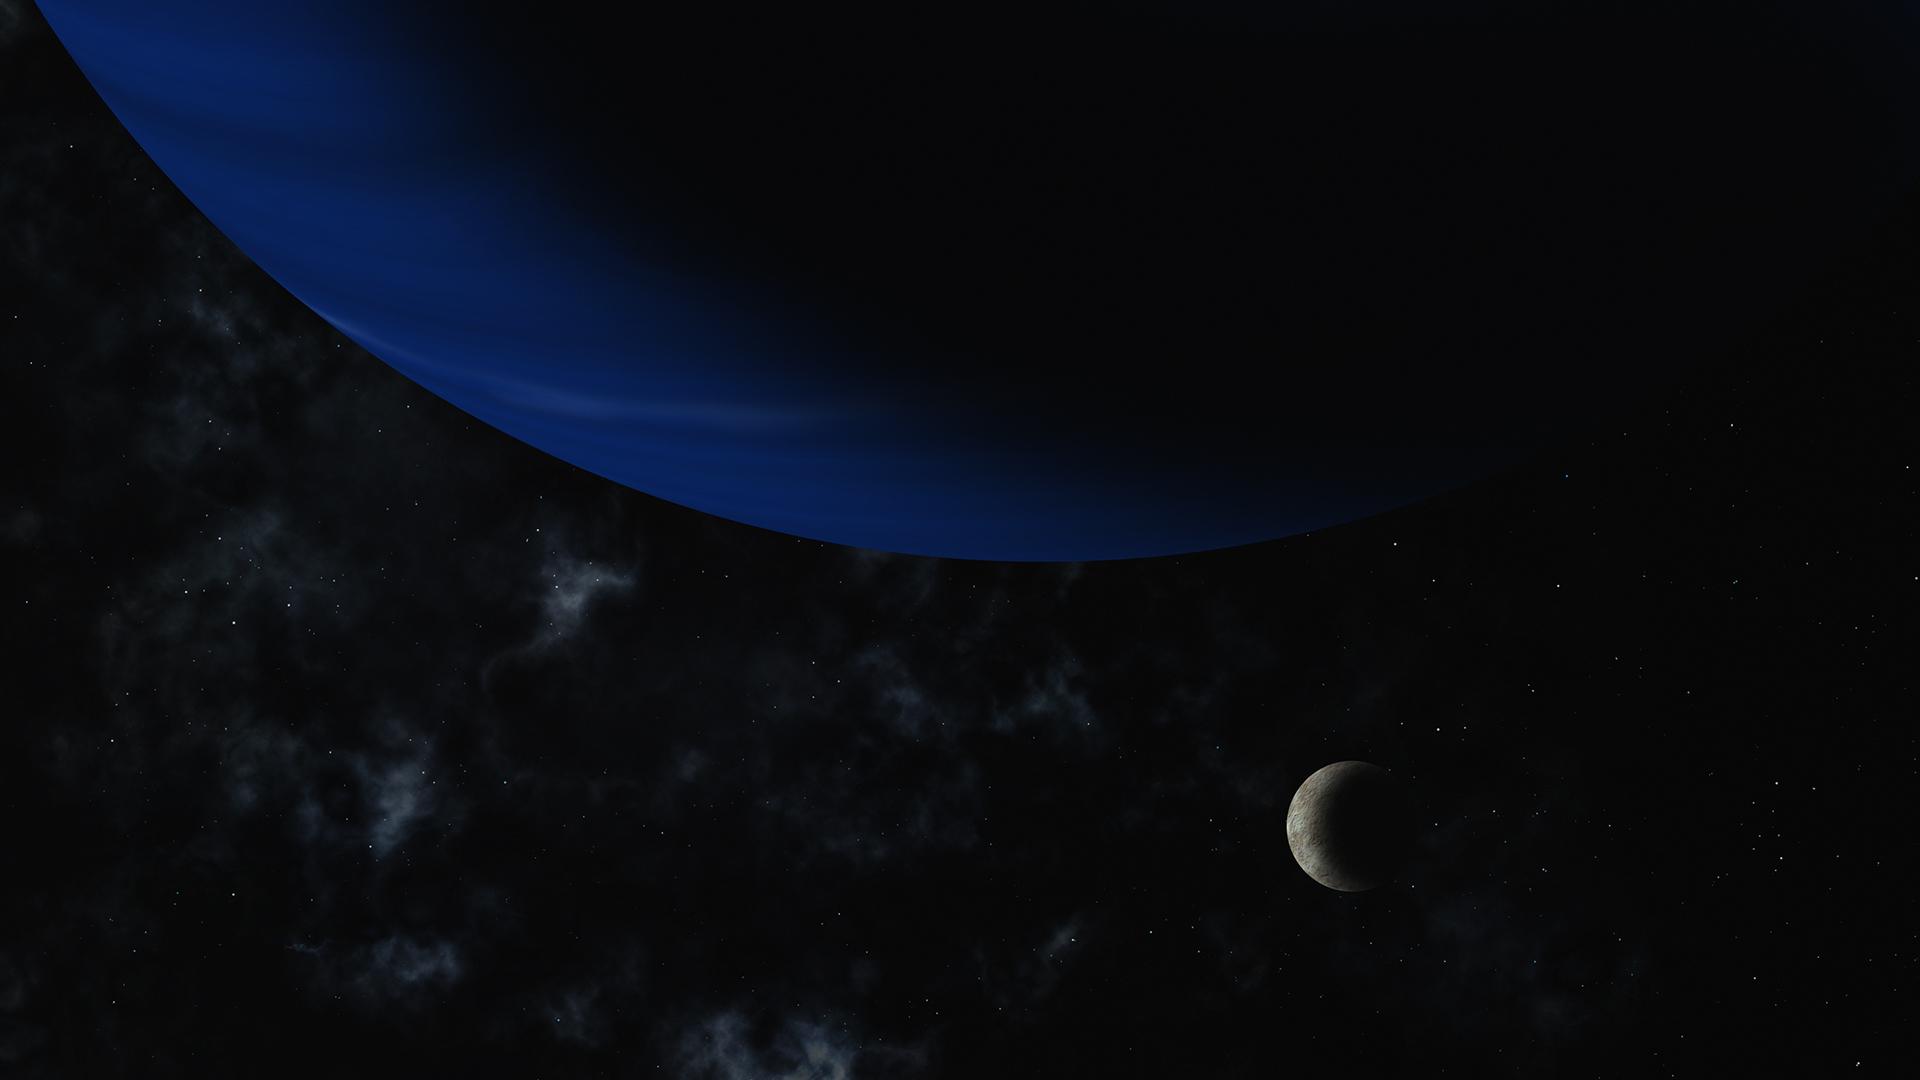 Neptune by Squirrel-slayer